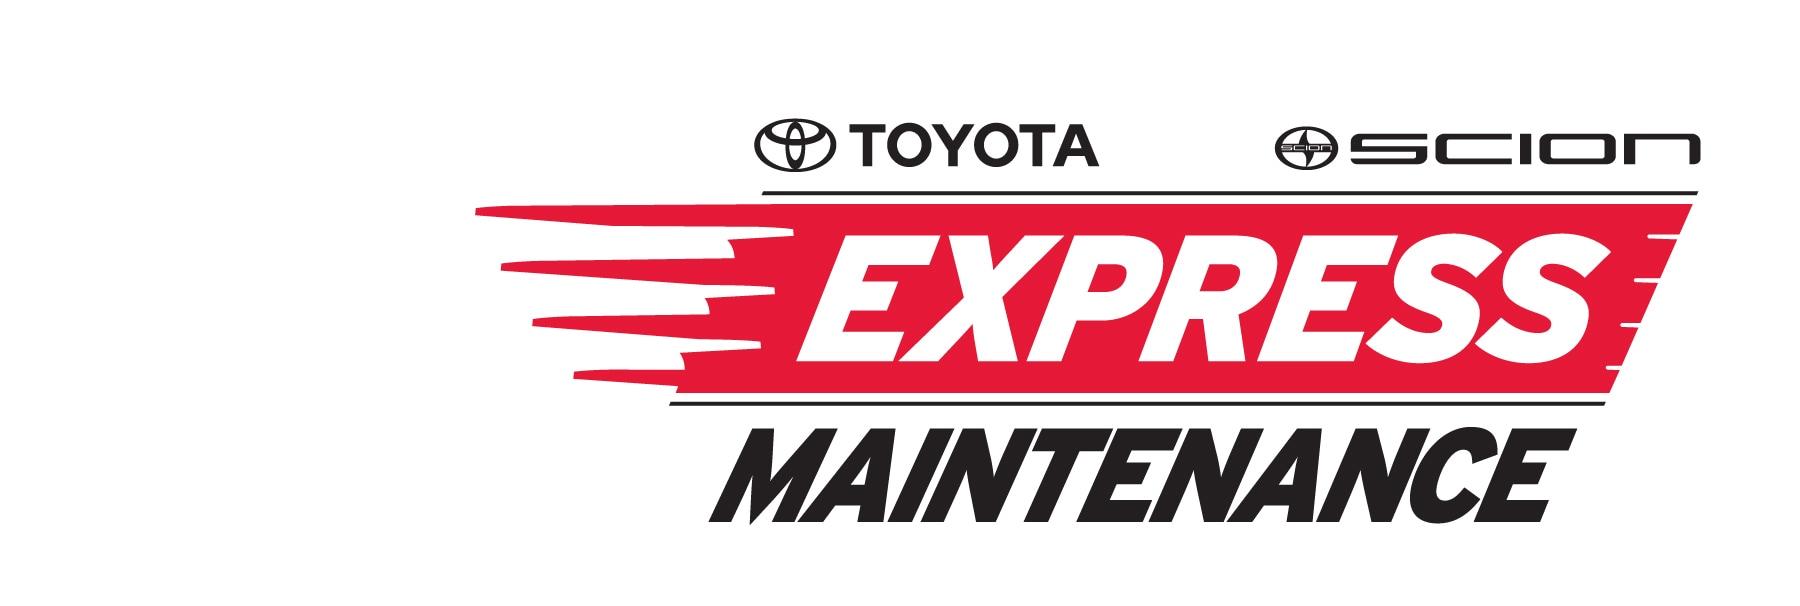 Charles Maund Toyota Austin Tx New And Used Toyota | 2017 ...